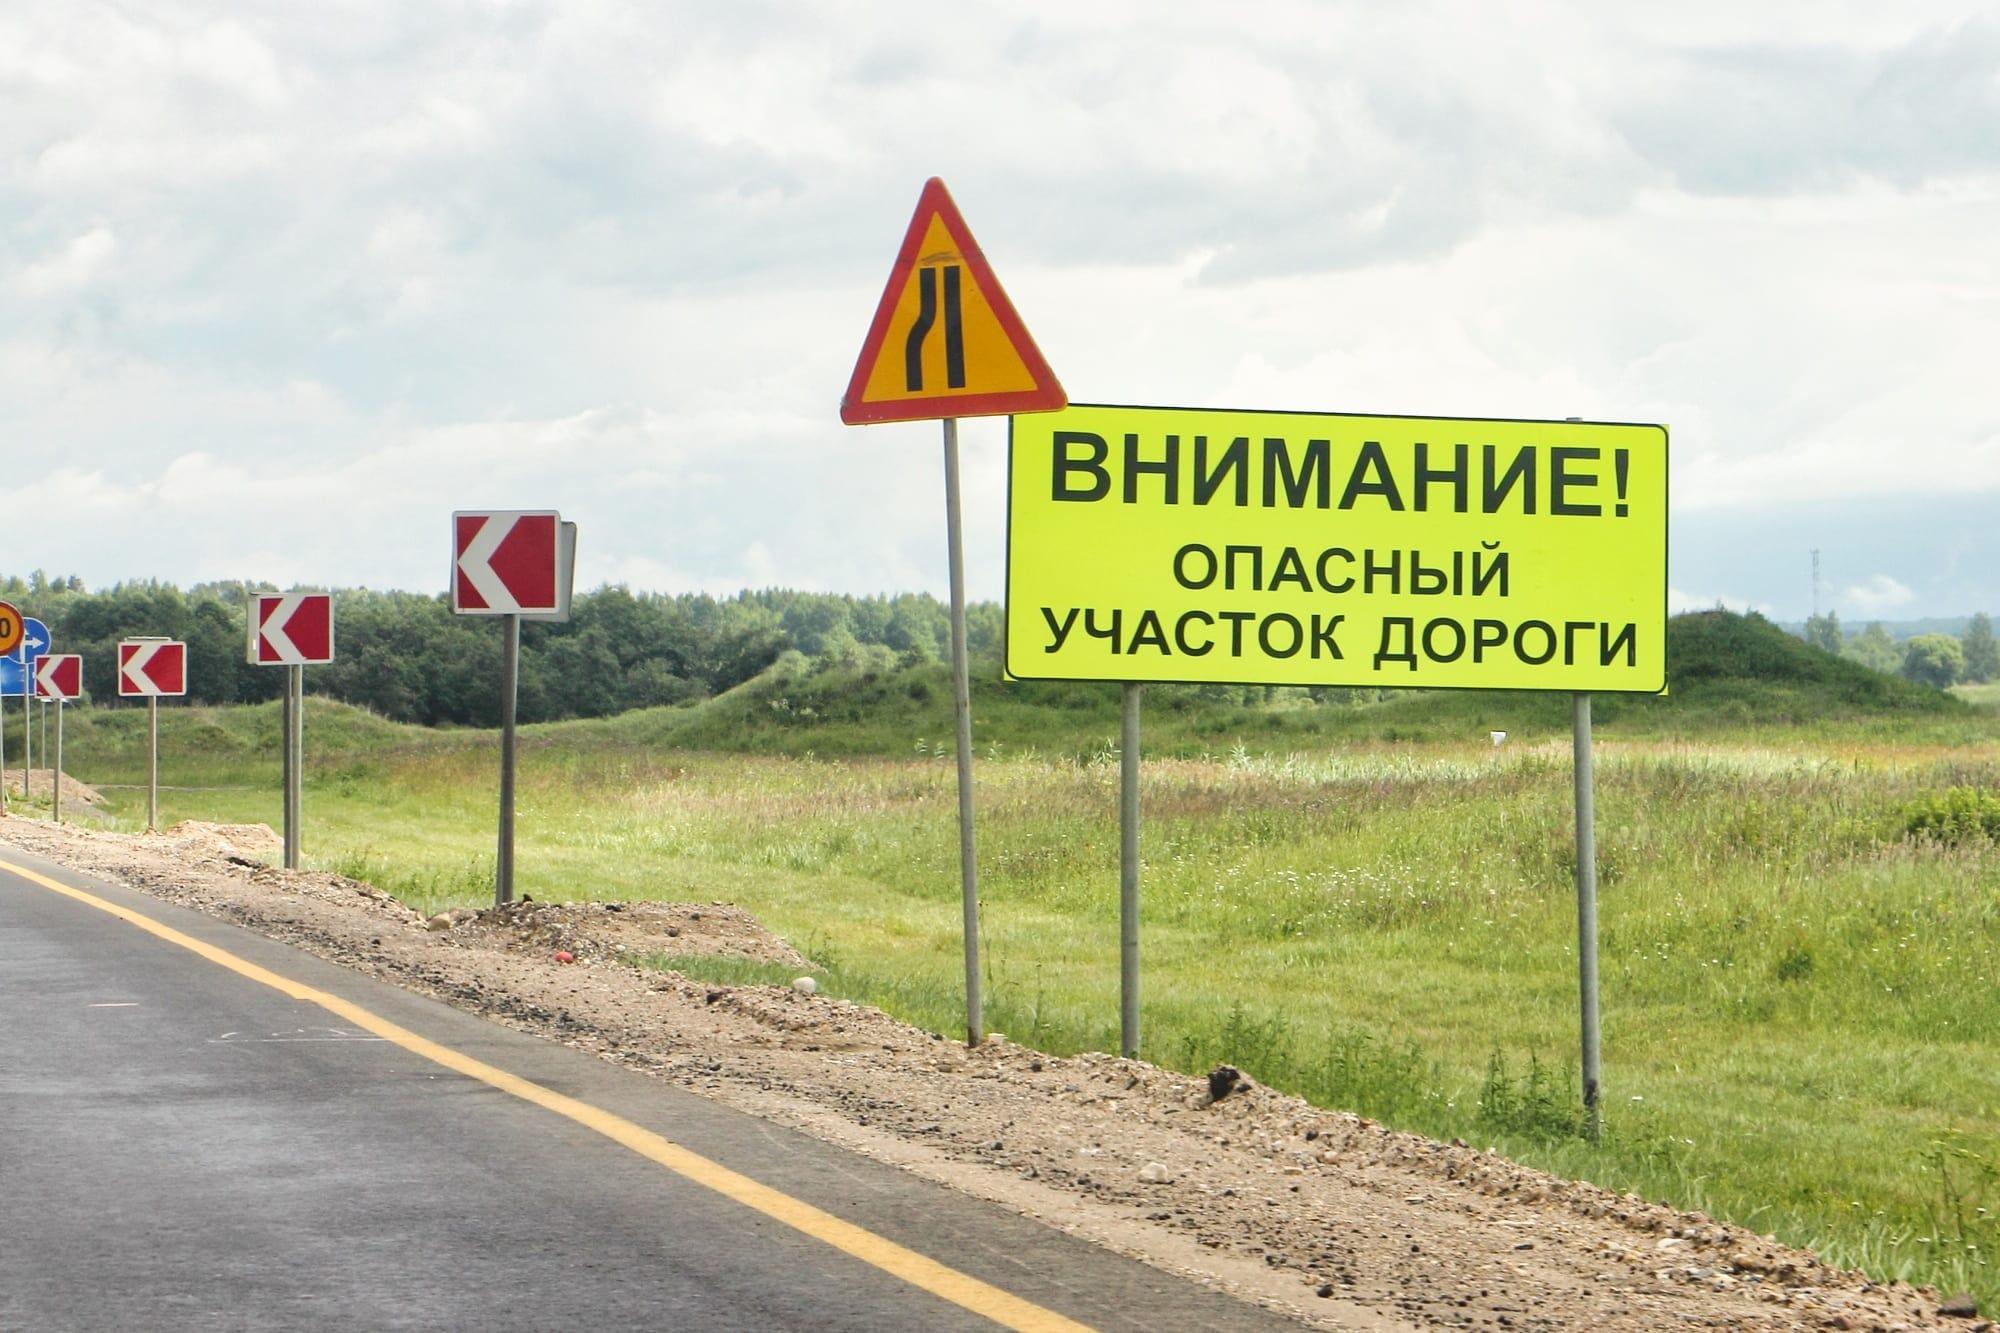 Verkehrsschild Russland ©ilmarinfoto/depositphotos.com